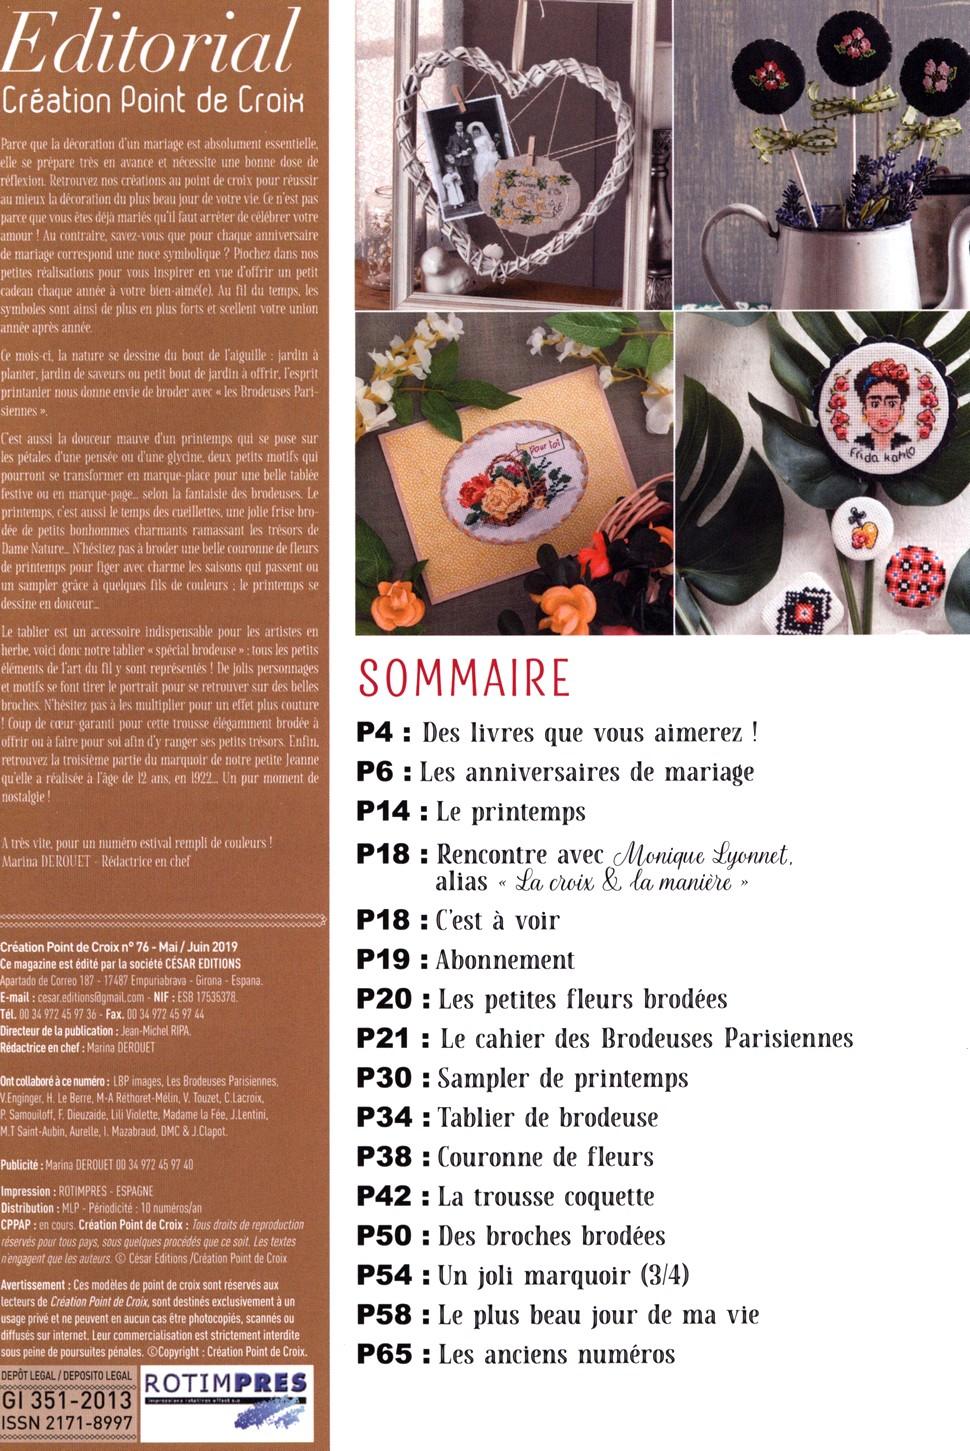 Французский журнал Creation Point de Croix №76 - 2019 (1)